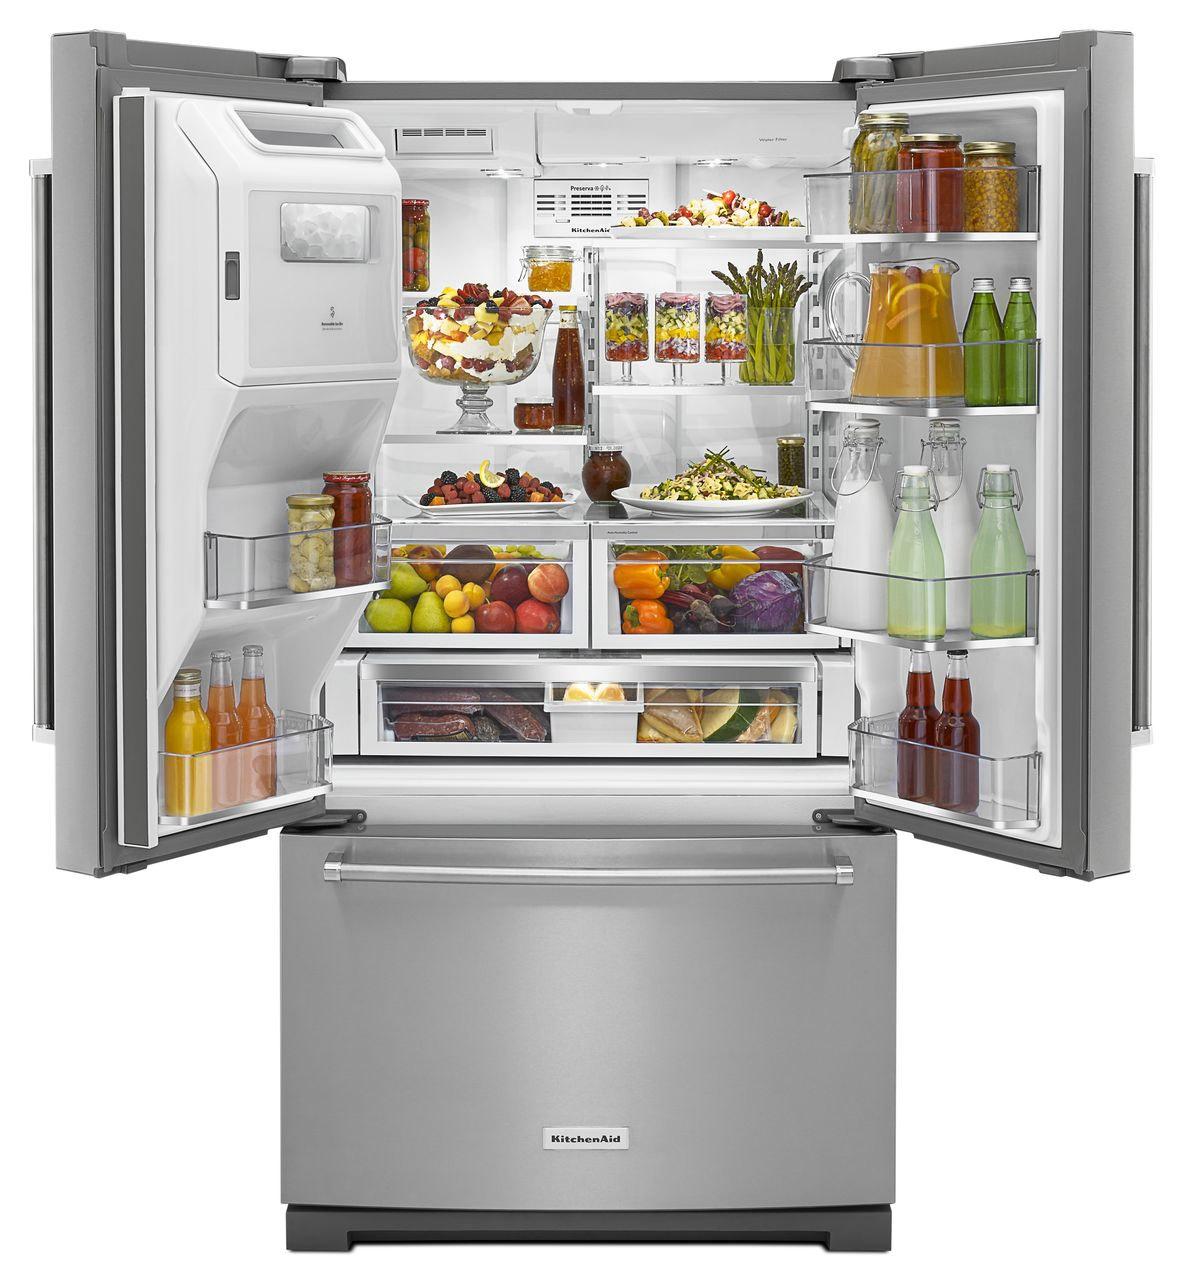 Kitchenaid french door refrigerator krff507ess larger image 1 2 rubansaba